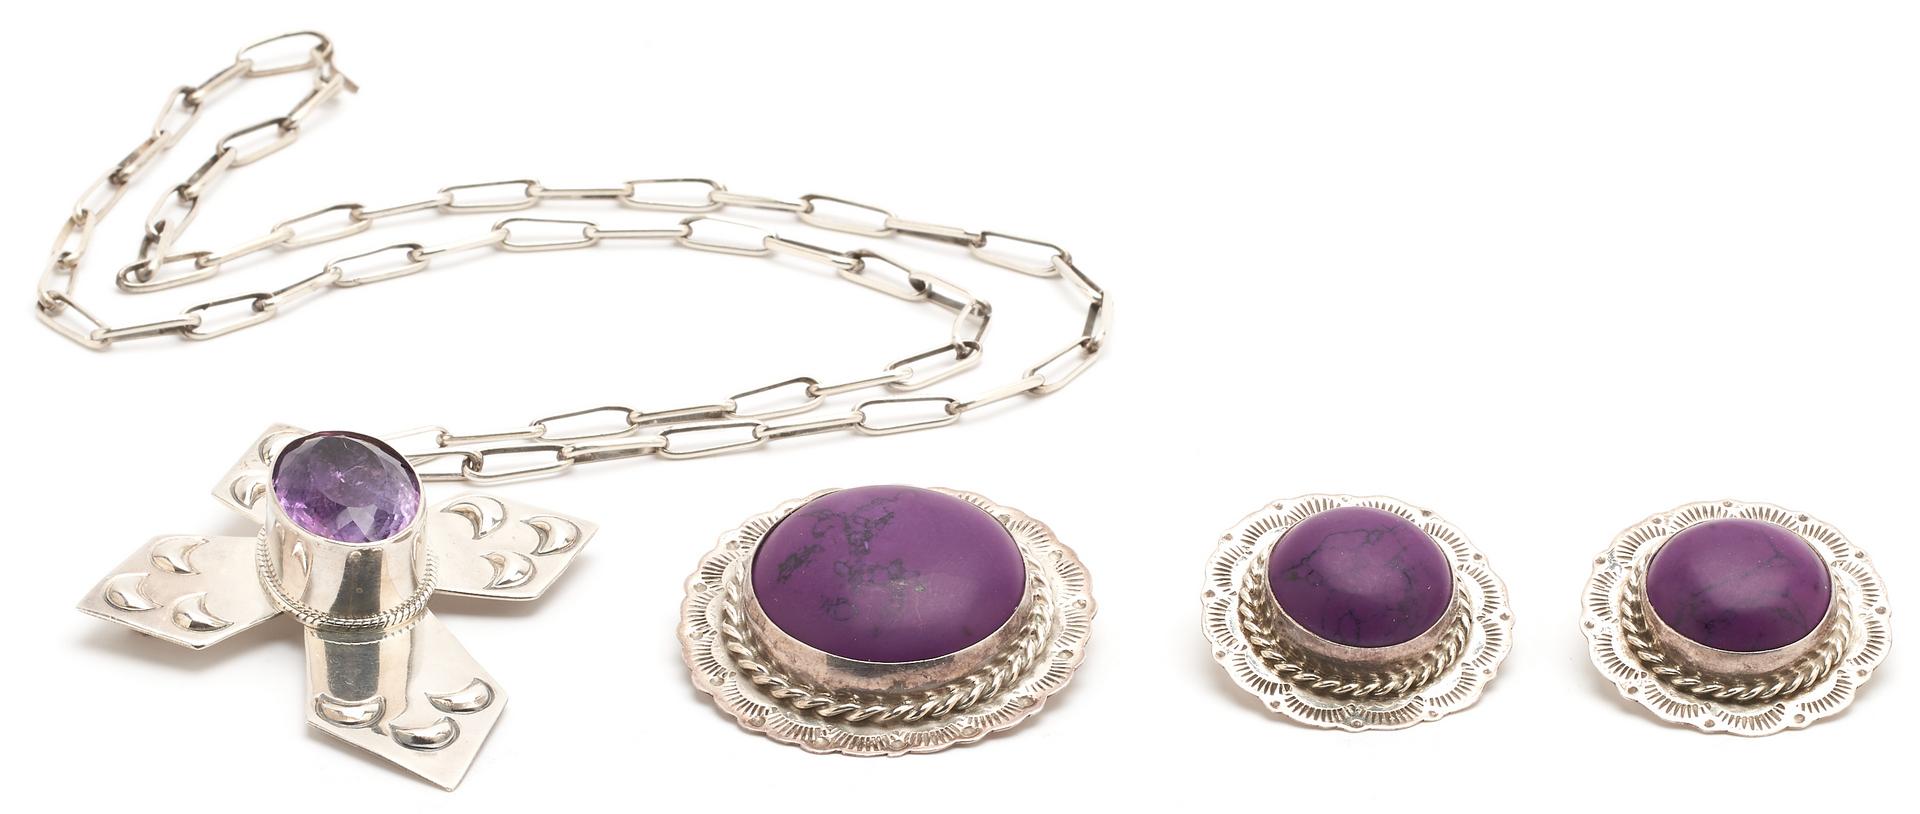 Lot 1218: 4 Pieces Sterling & Purple Stone Jewelry Pcs.